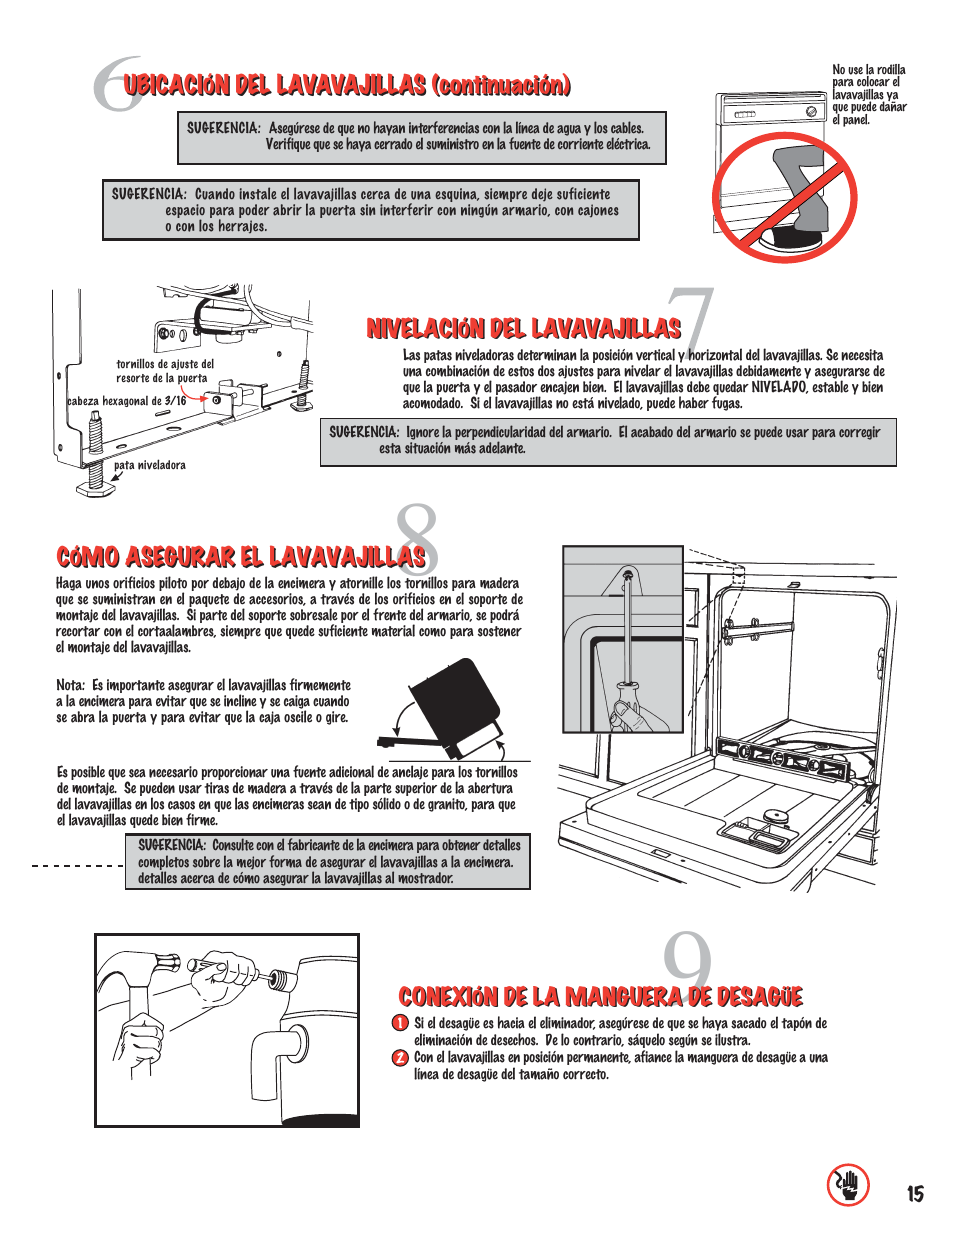 maytag mdb6100awb installation user manual page 15 16 original rh manualsdir com manual installation autocad express tools Installation Guide